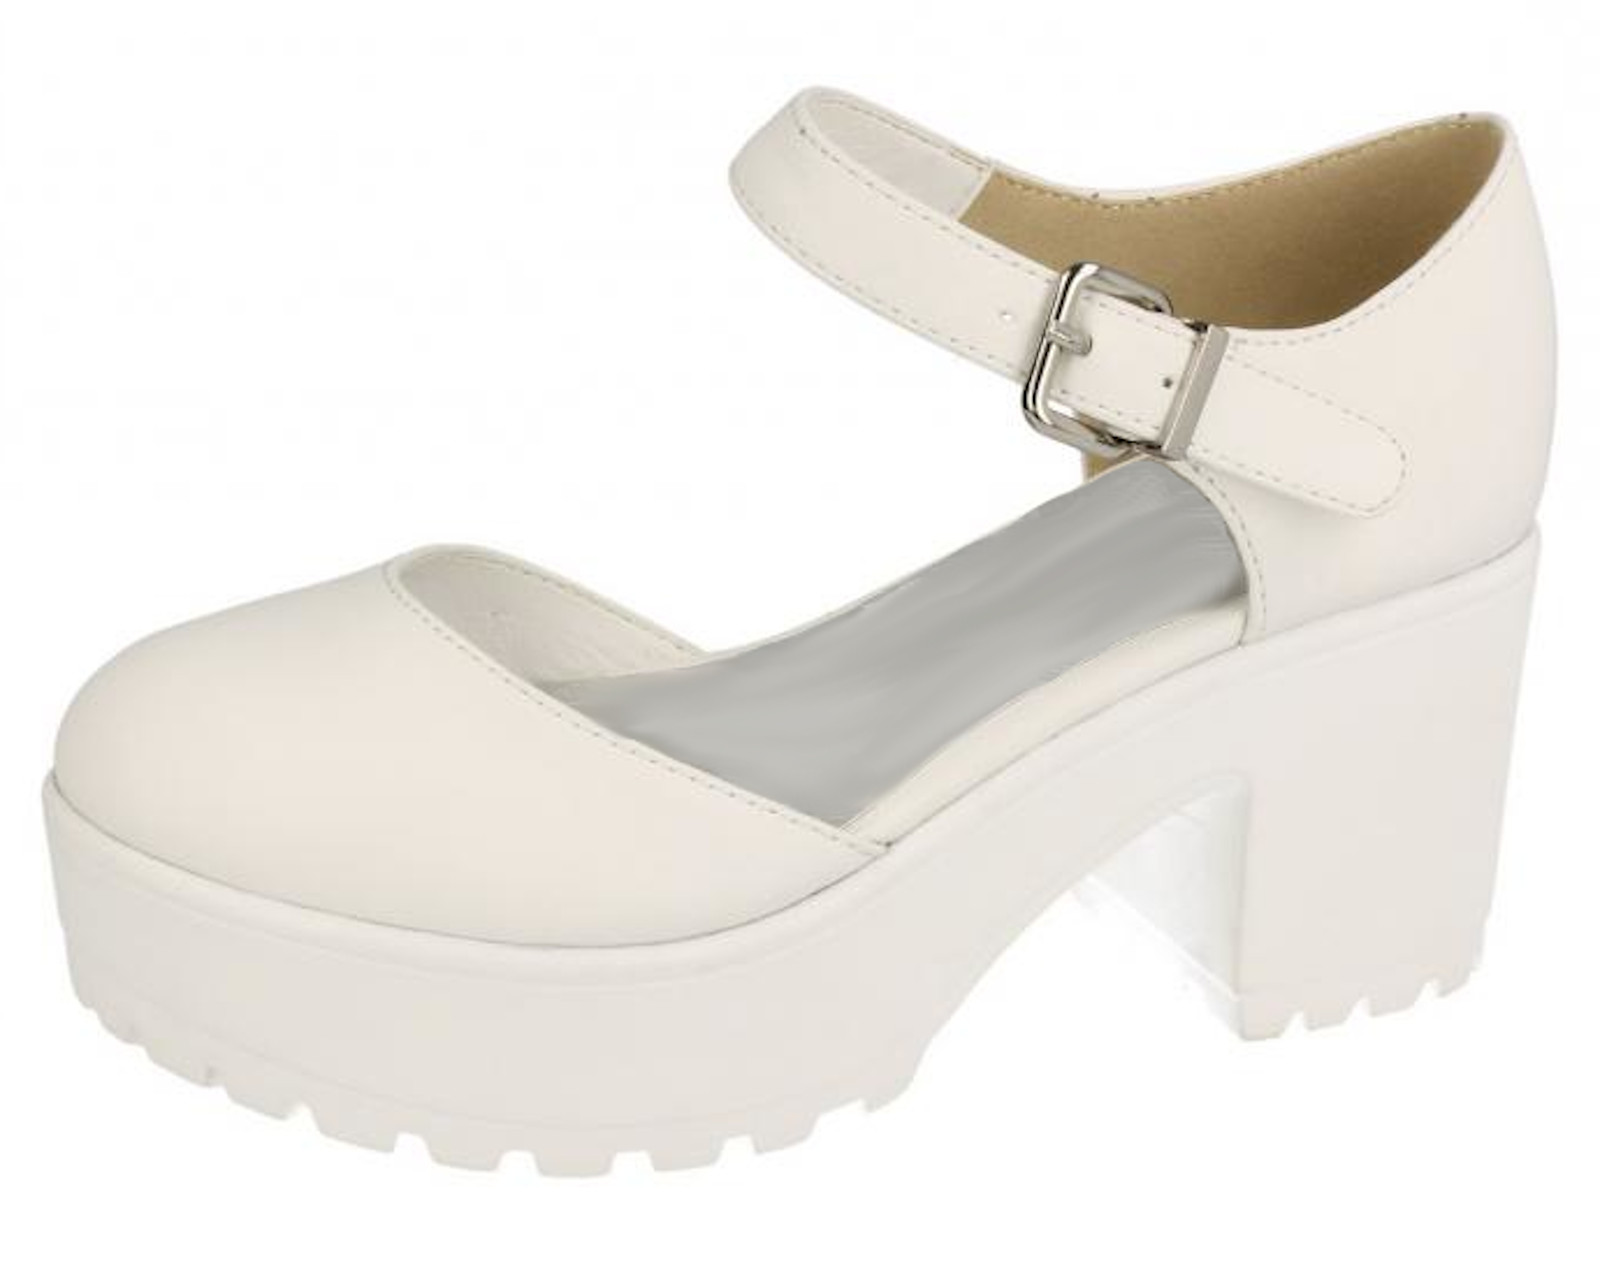 Girls Platform Chunky Low Block Heel Shoes Sandals Kids Closed Toe School Shoes